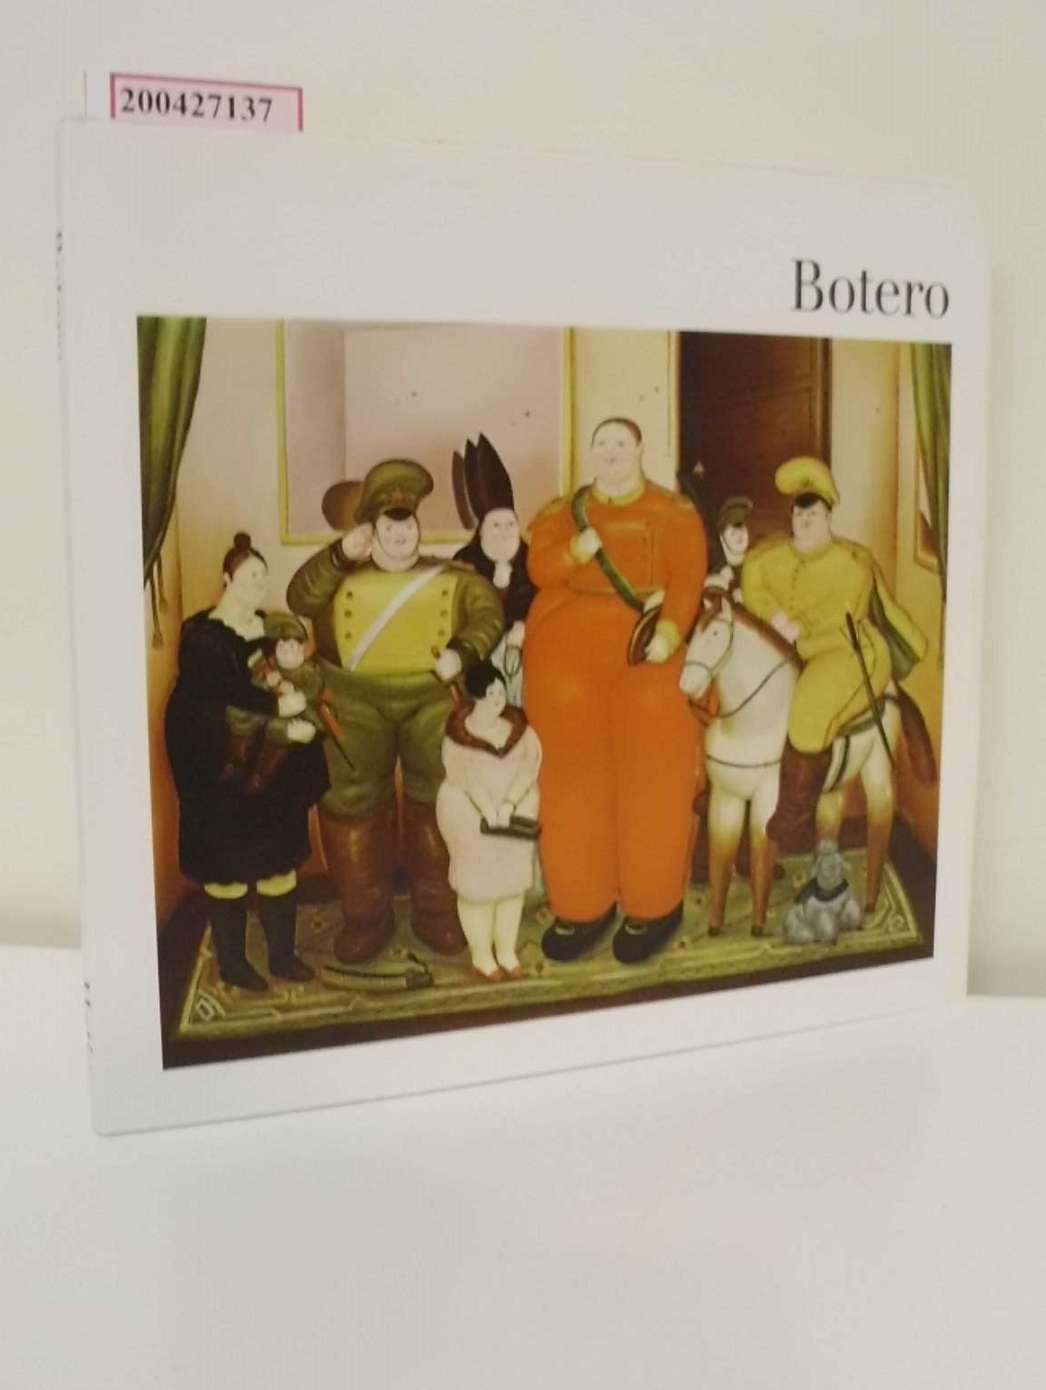 Botero / Klaus Gallwitz / Kunst heute ; 25